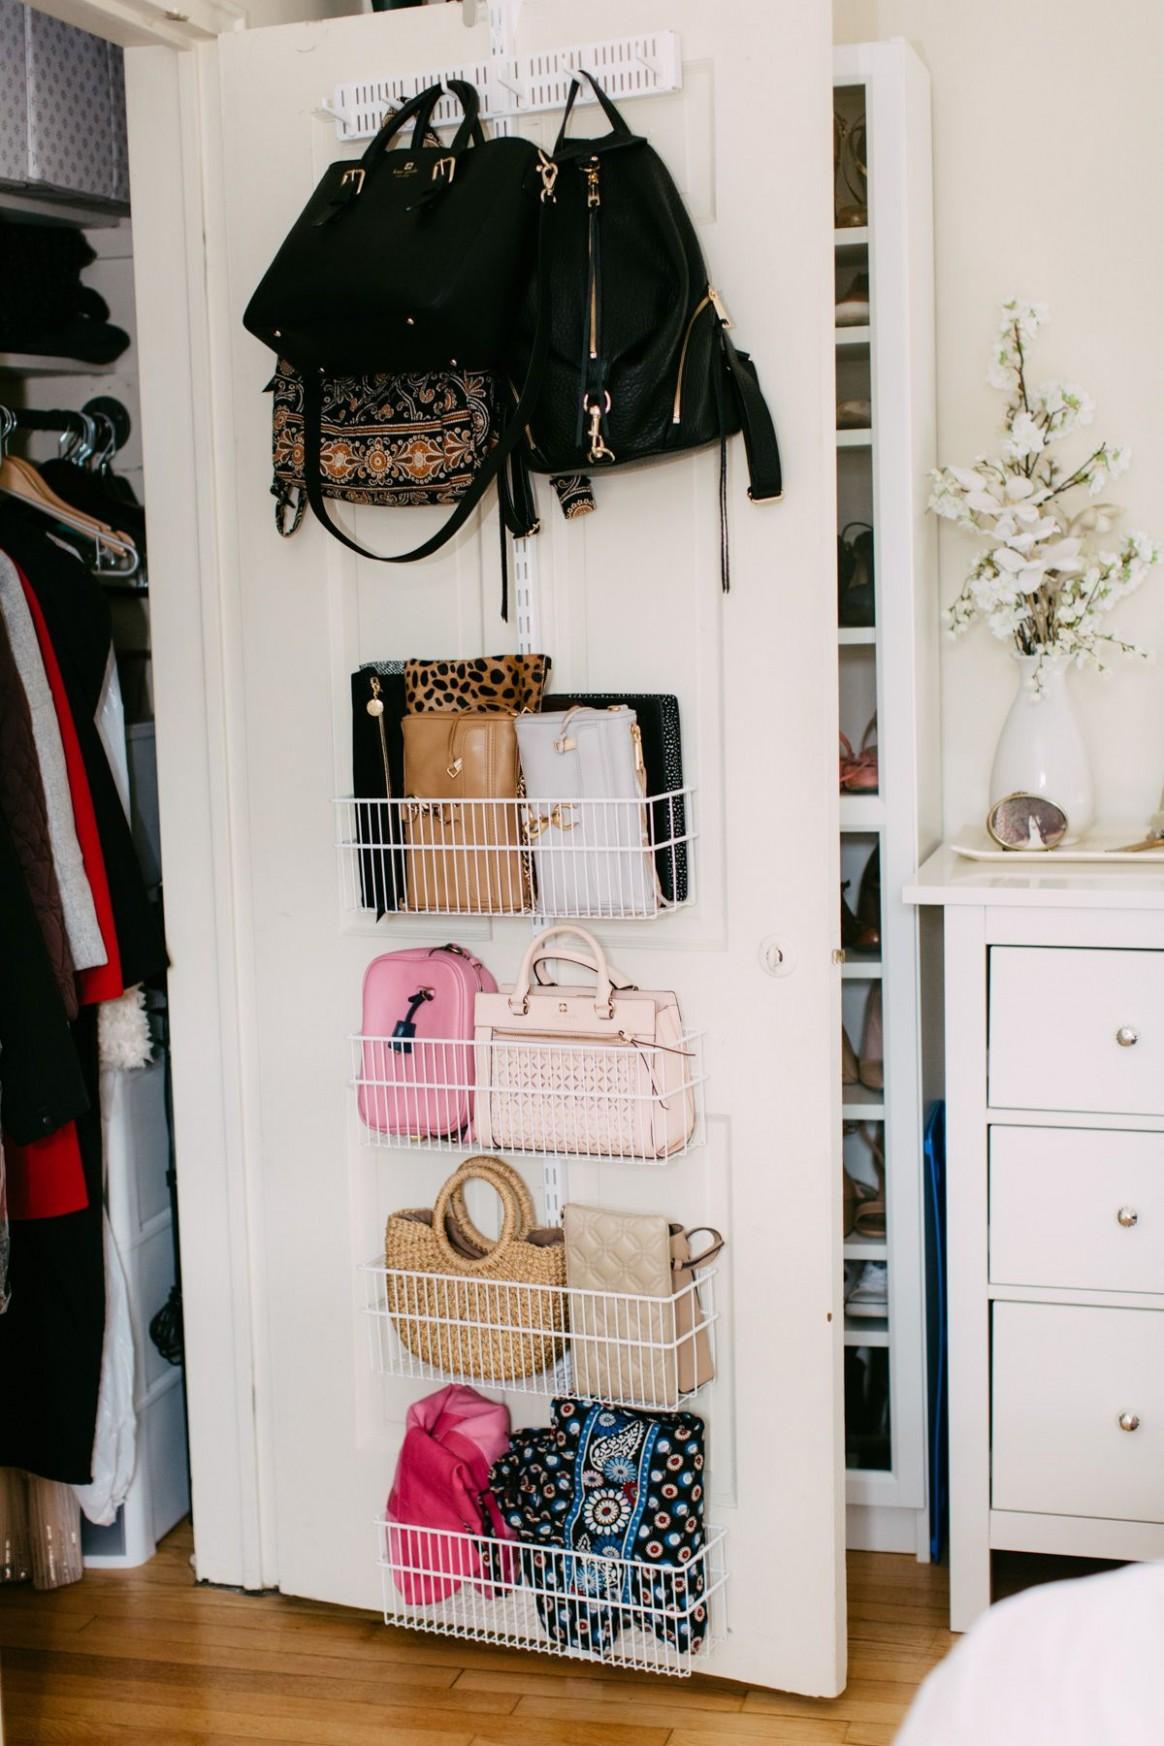 12 Small Bedroom Storage Ideas - DIY Storage Ideas for Small Rooms - Closet Ideas For Small Bedrooms